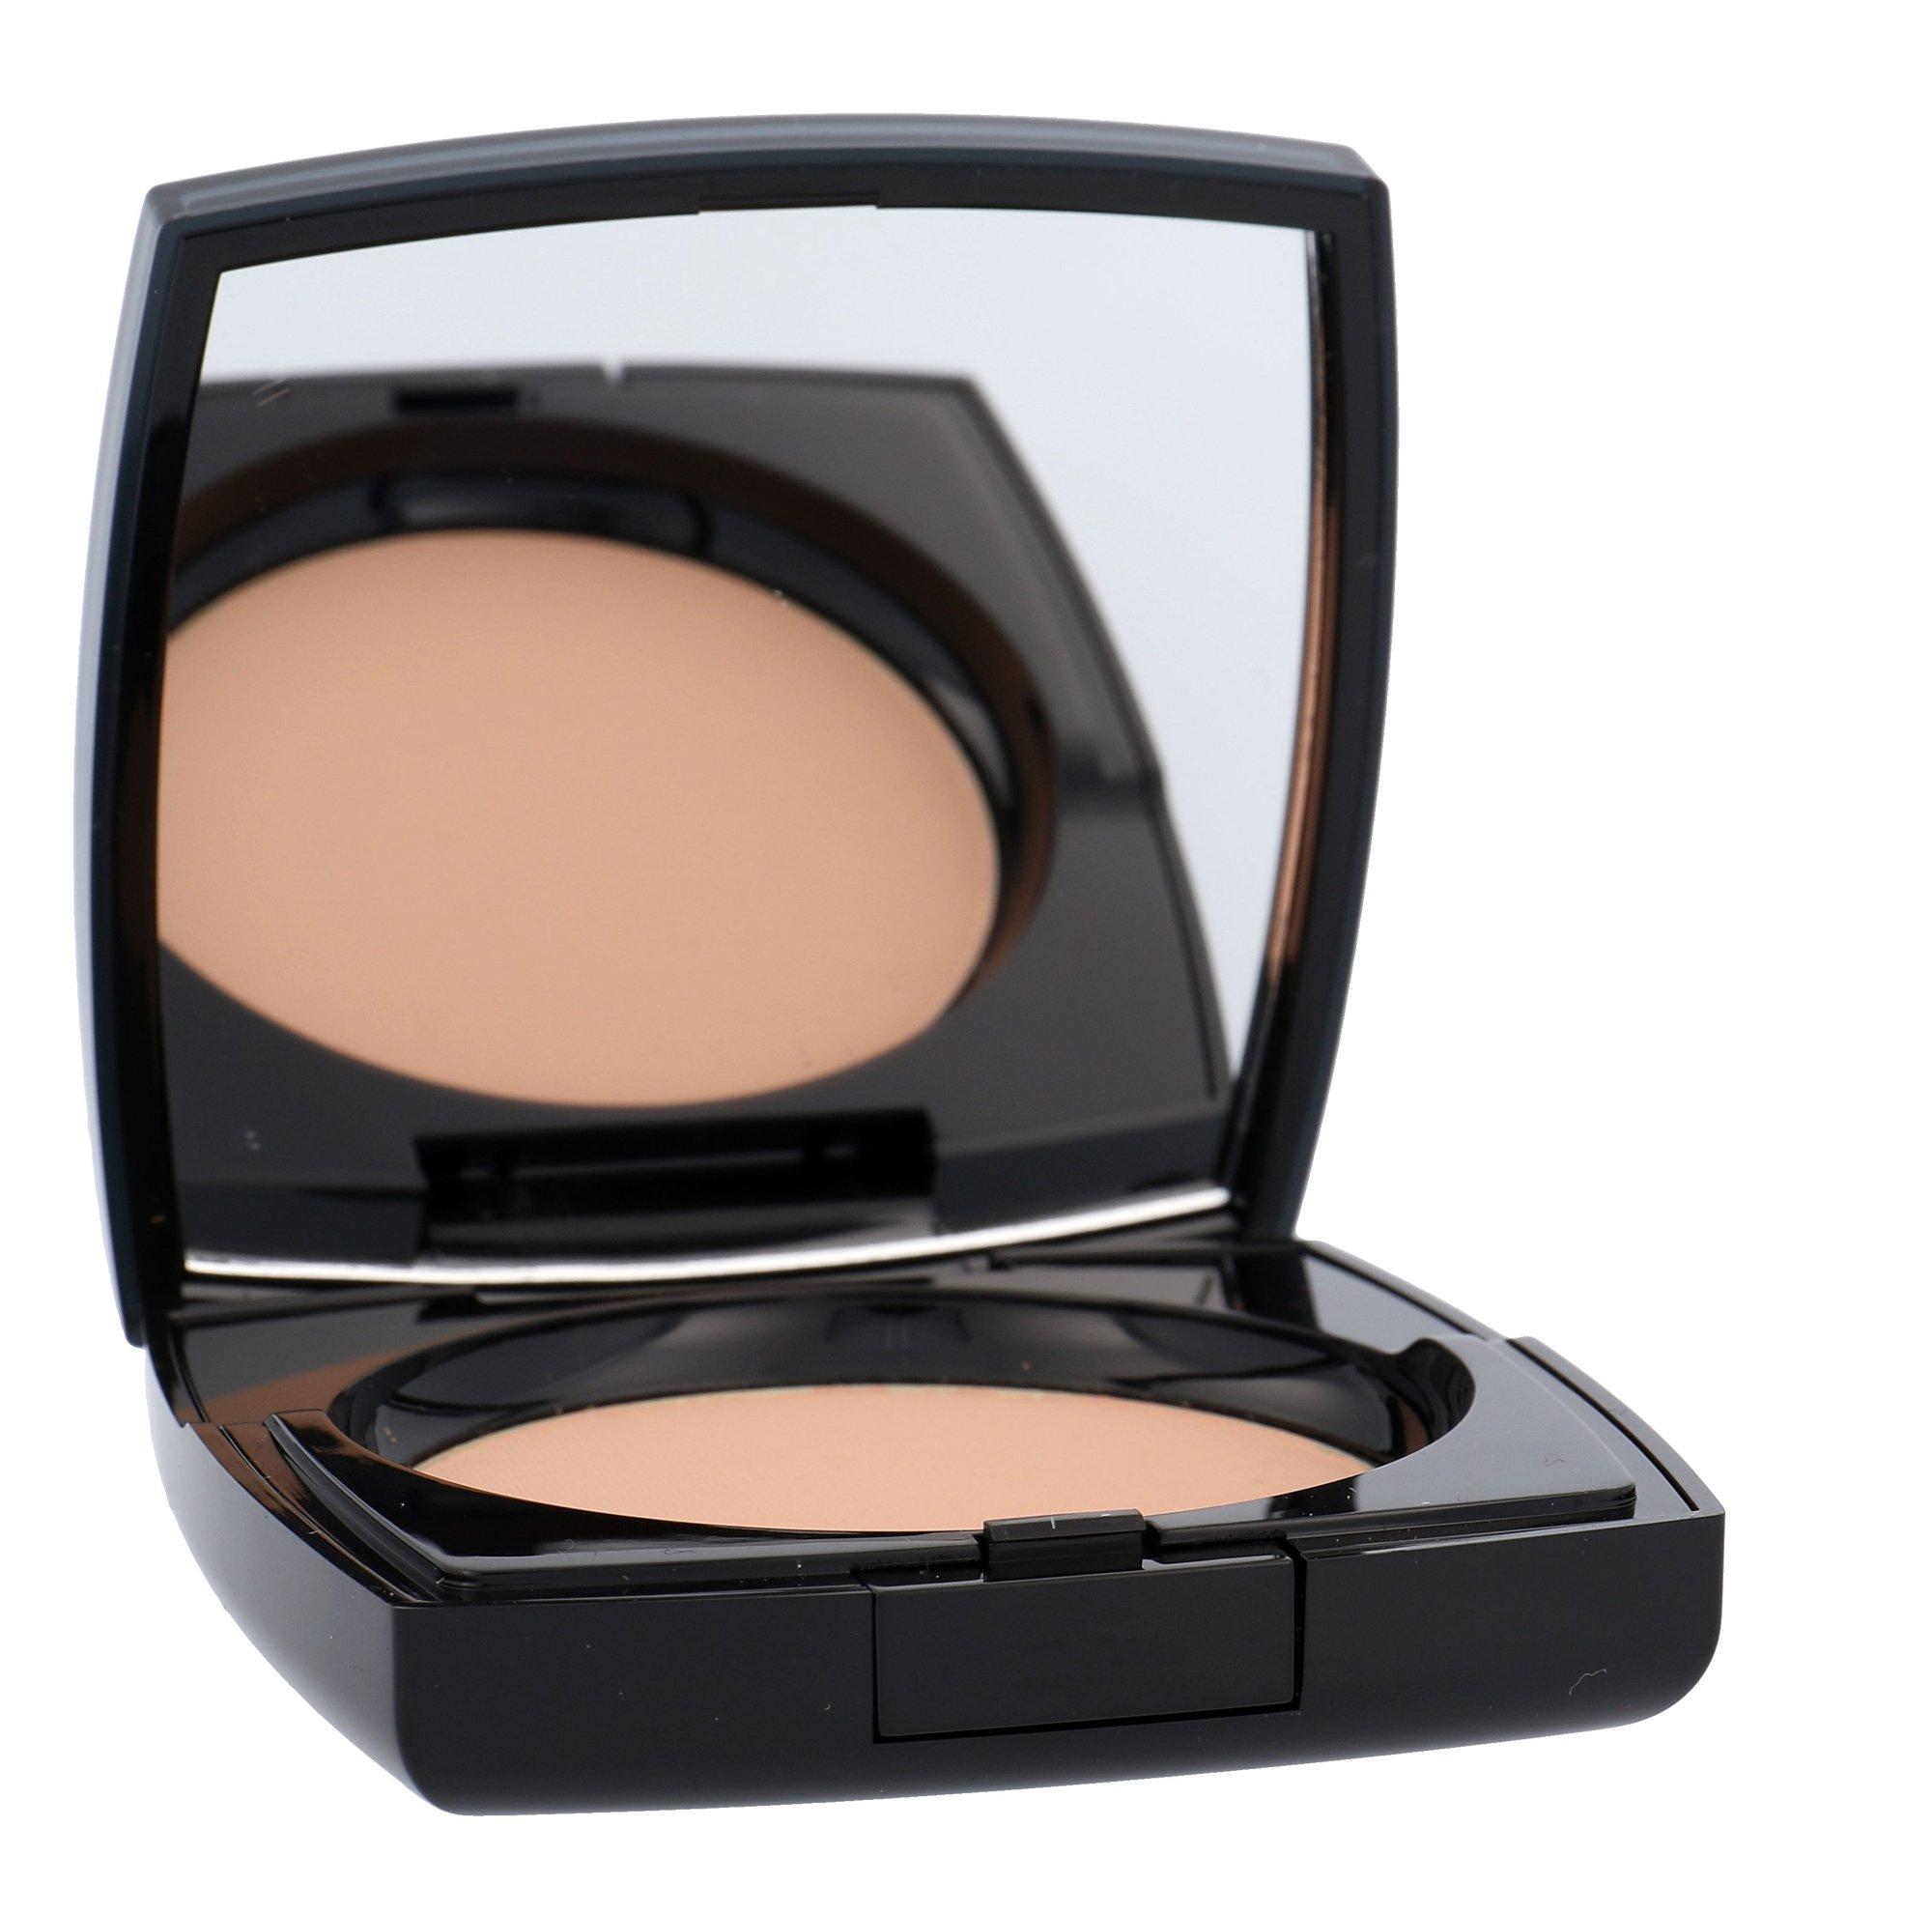 Lancôme Poudre Majeure Excellence Cosmetic 10ml 04 Peche Doree